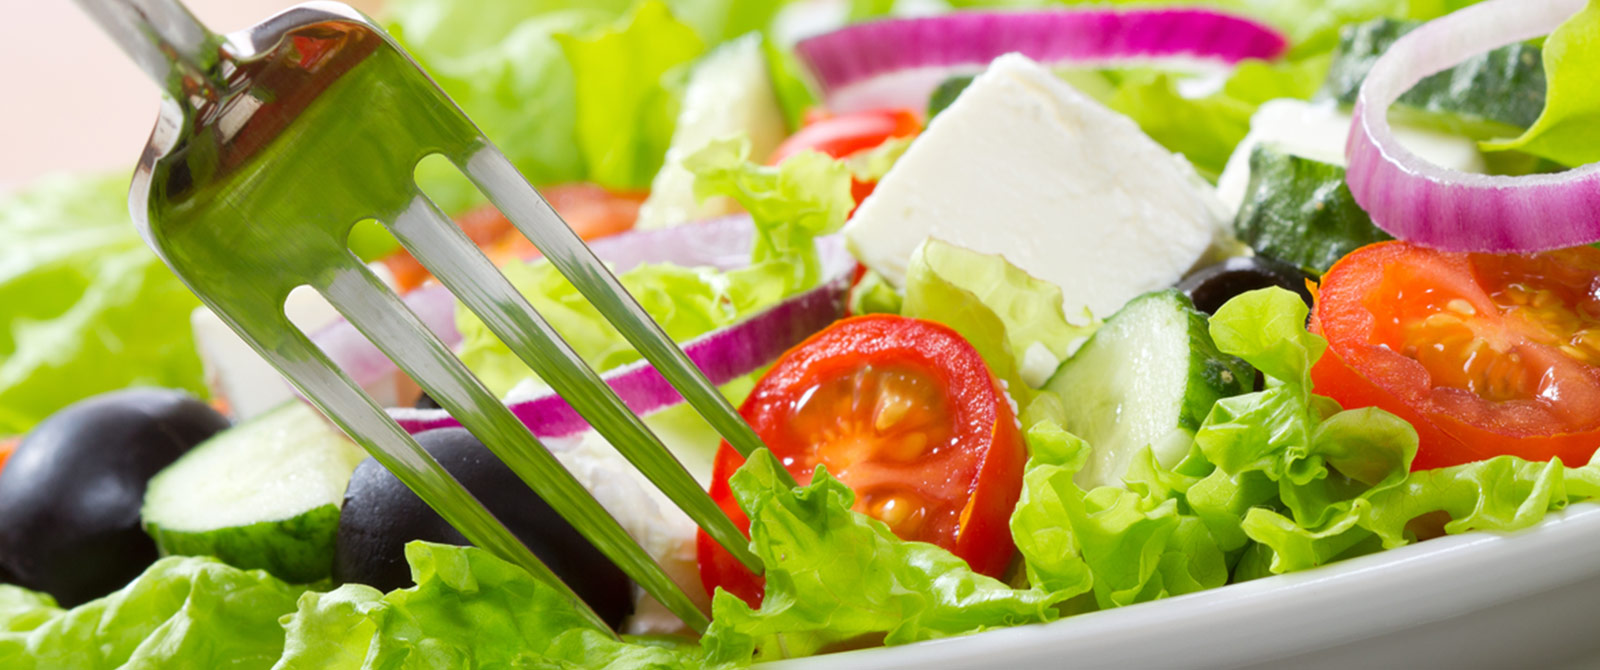 Marketplace Foods Produce